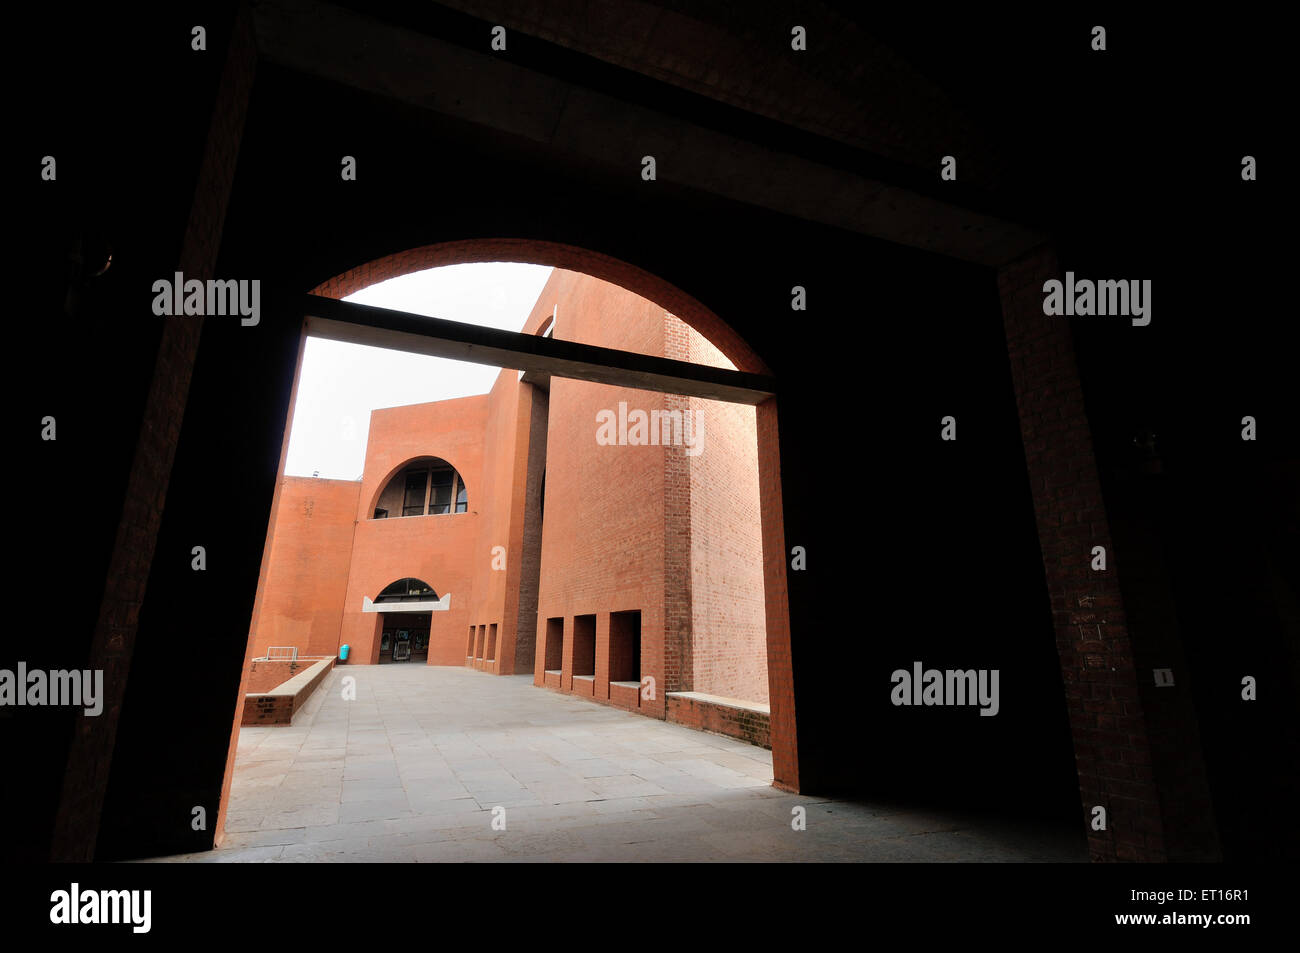 Indian Institute of Management Ahmedabad Gujarat Indian Asia - Stock Image